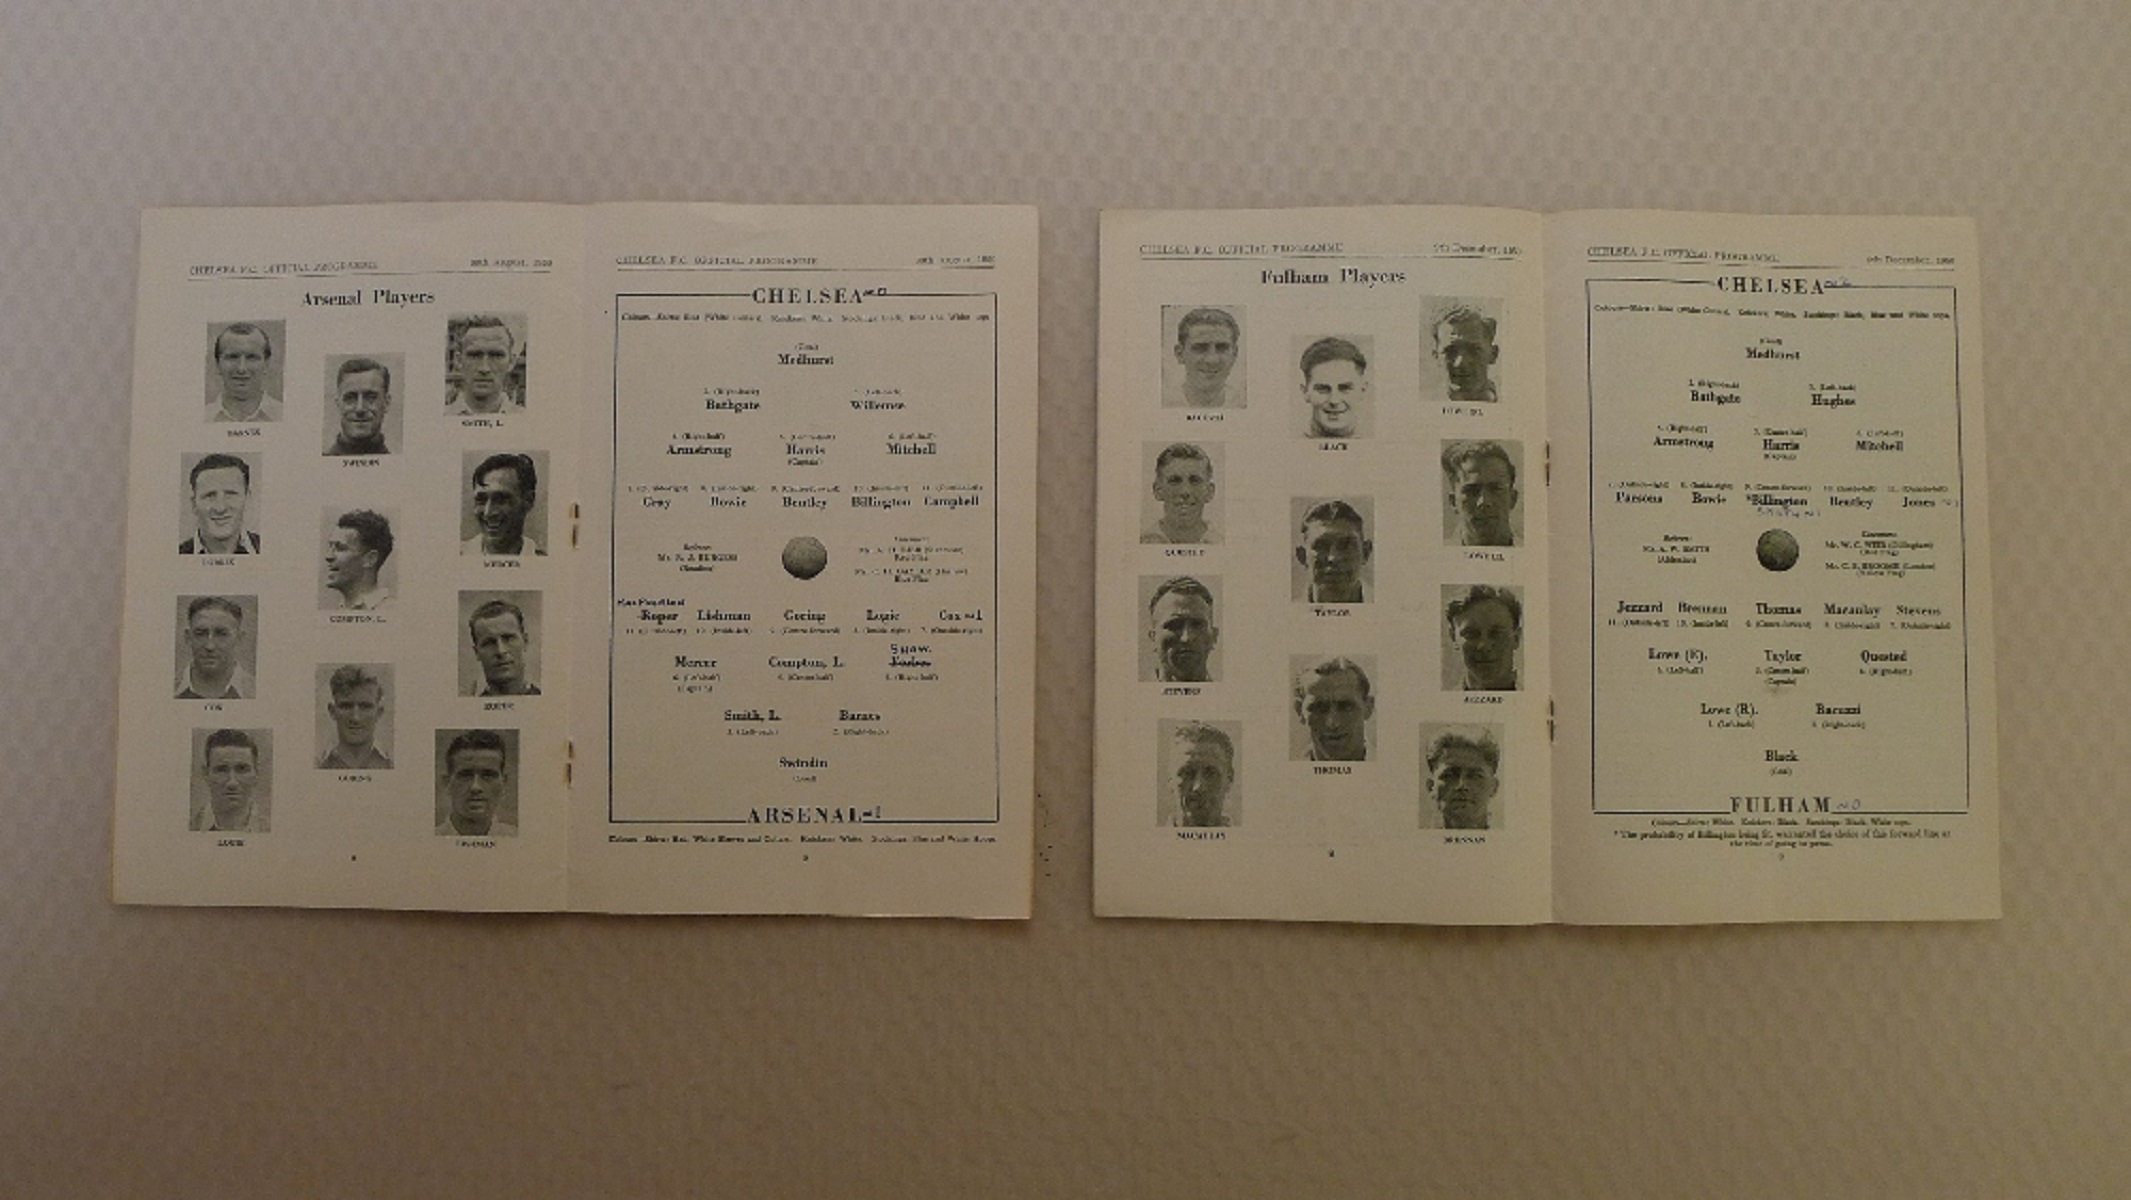 Vintage Football Programmes. 2 x Chelsea 1950 / 51 Season football programmes comprising v Arsenal - Image 2 of 3